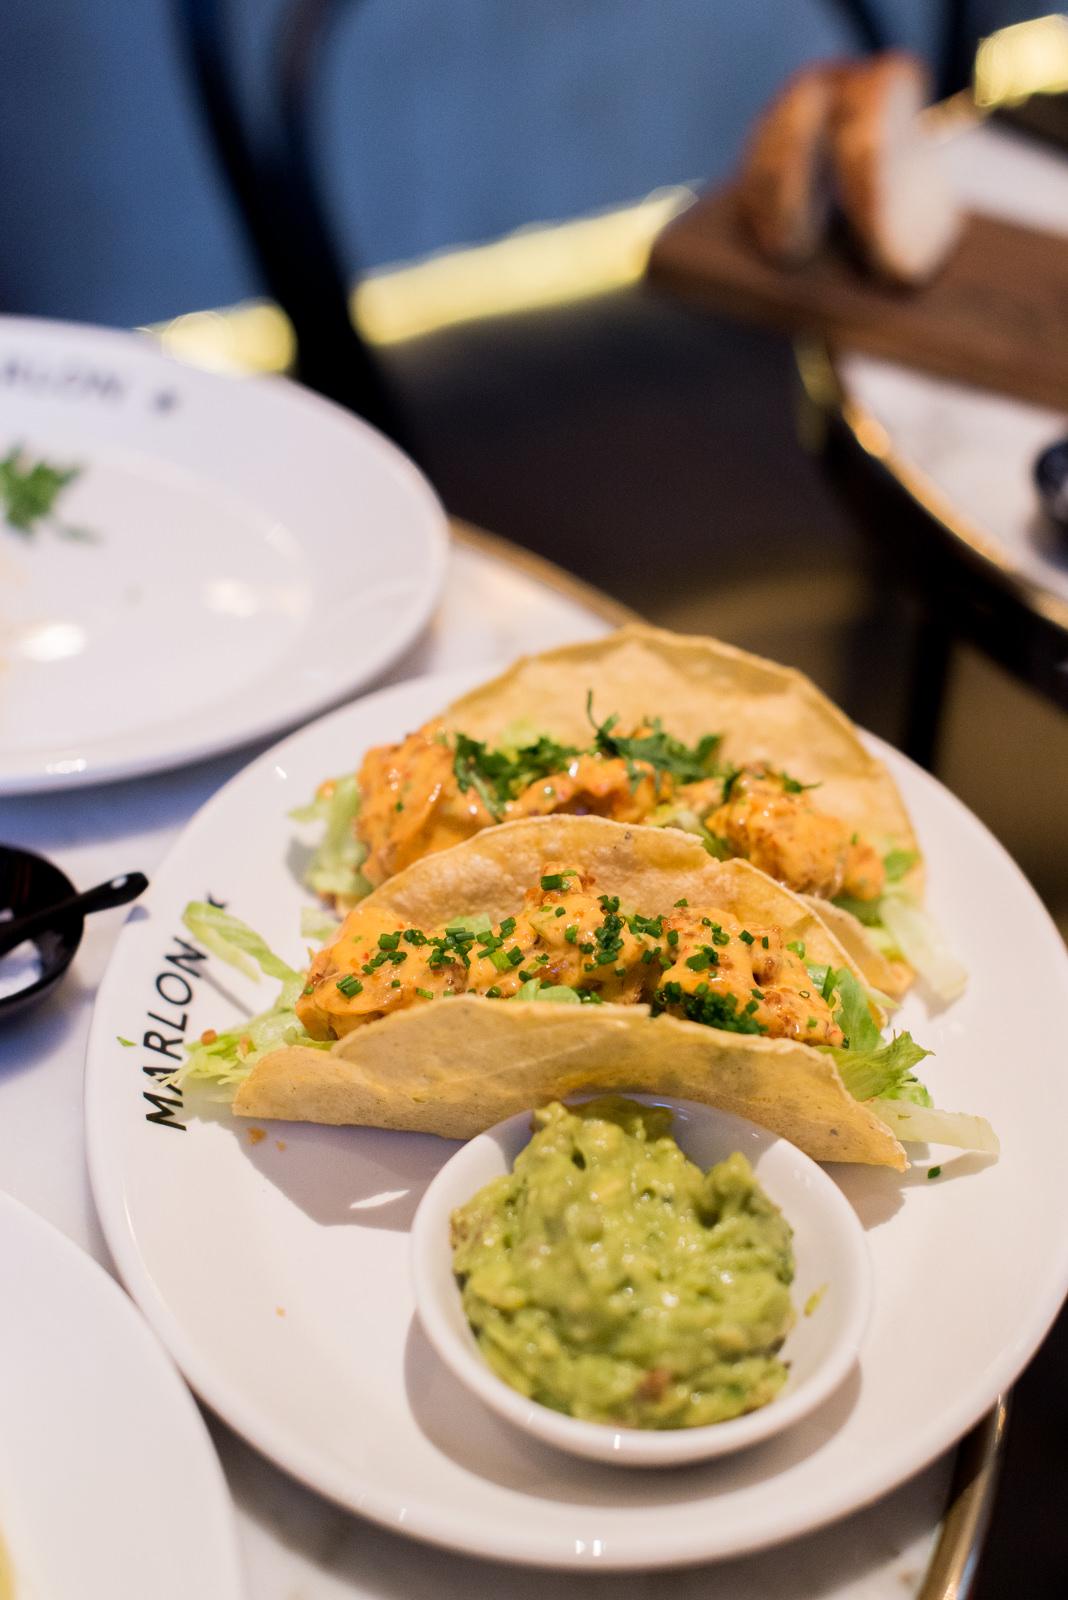 Blog-Mode-And-The-City-Lifestyle-Cinq-Petites-Choses-186-restaurant-Marlon